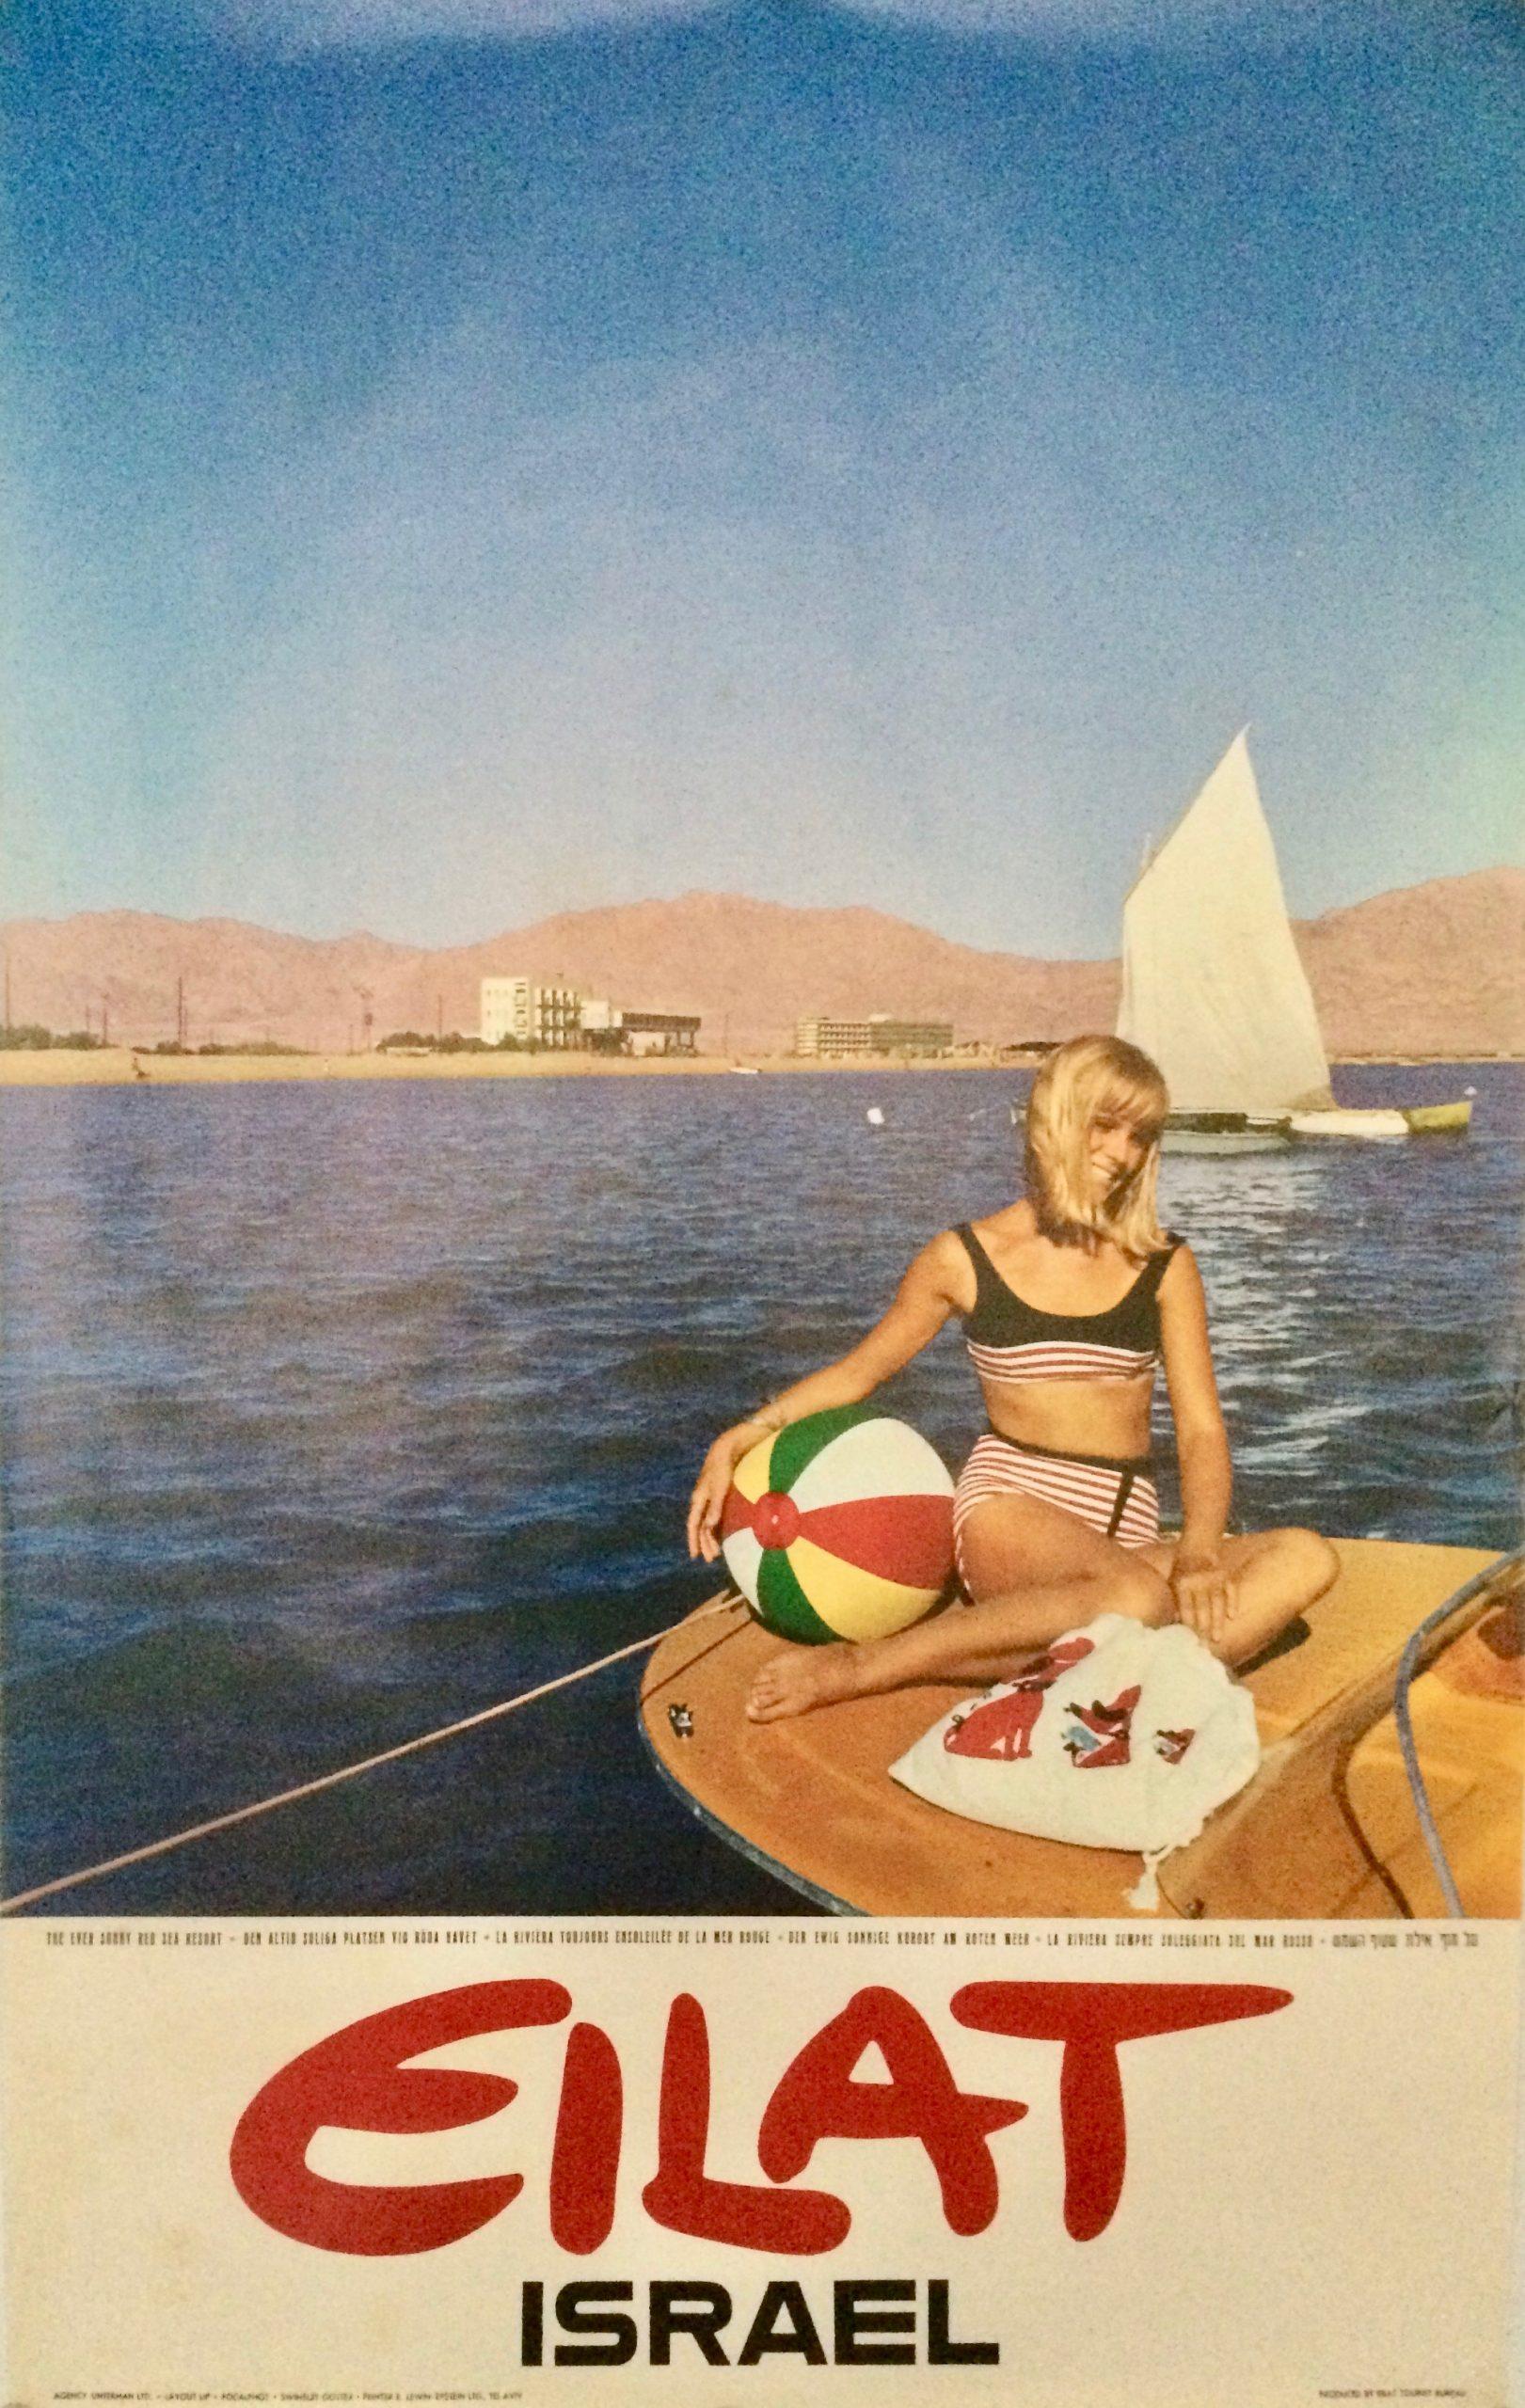 Travel to Eilat Israel